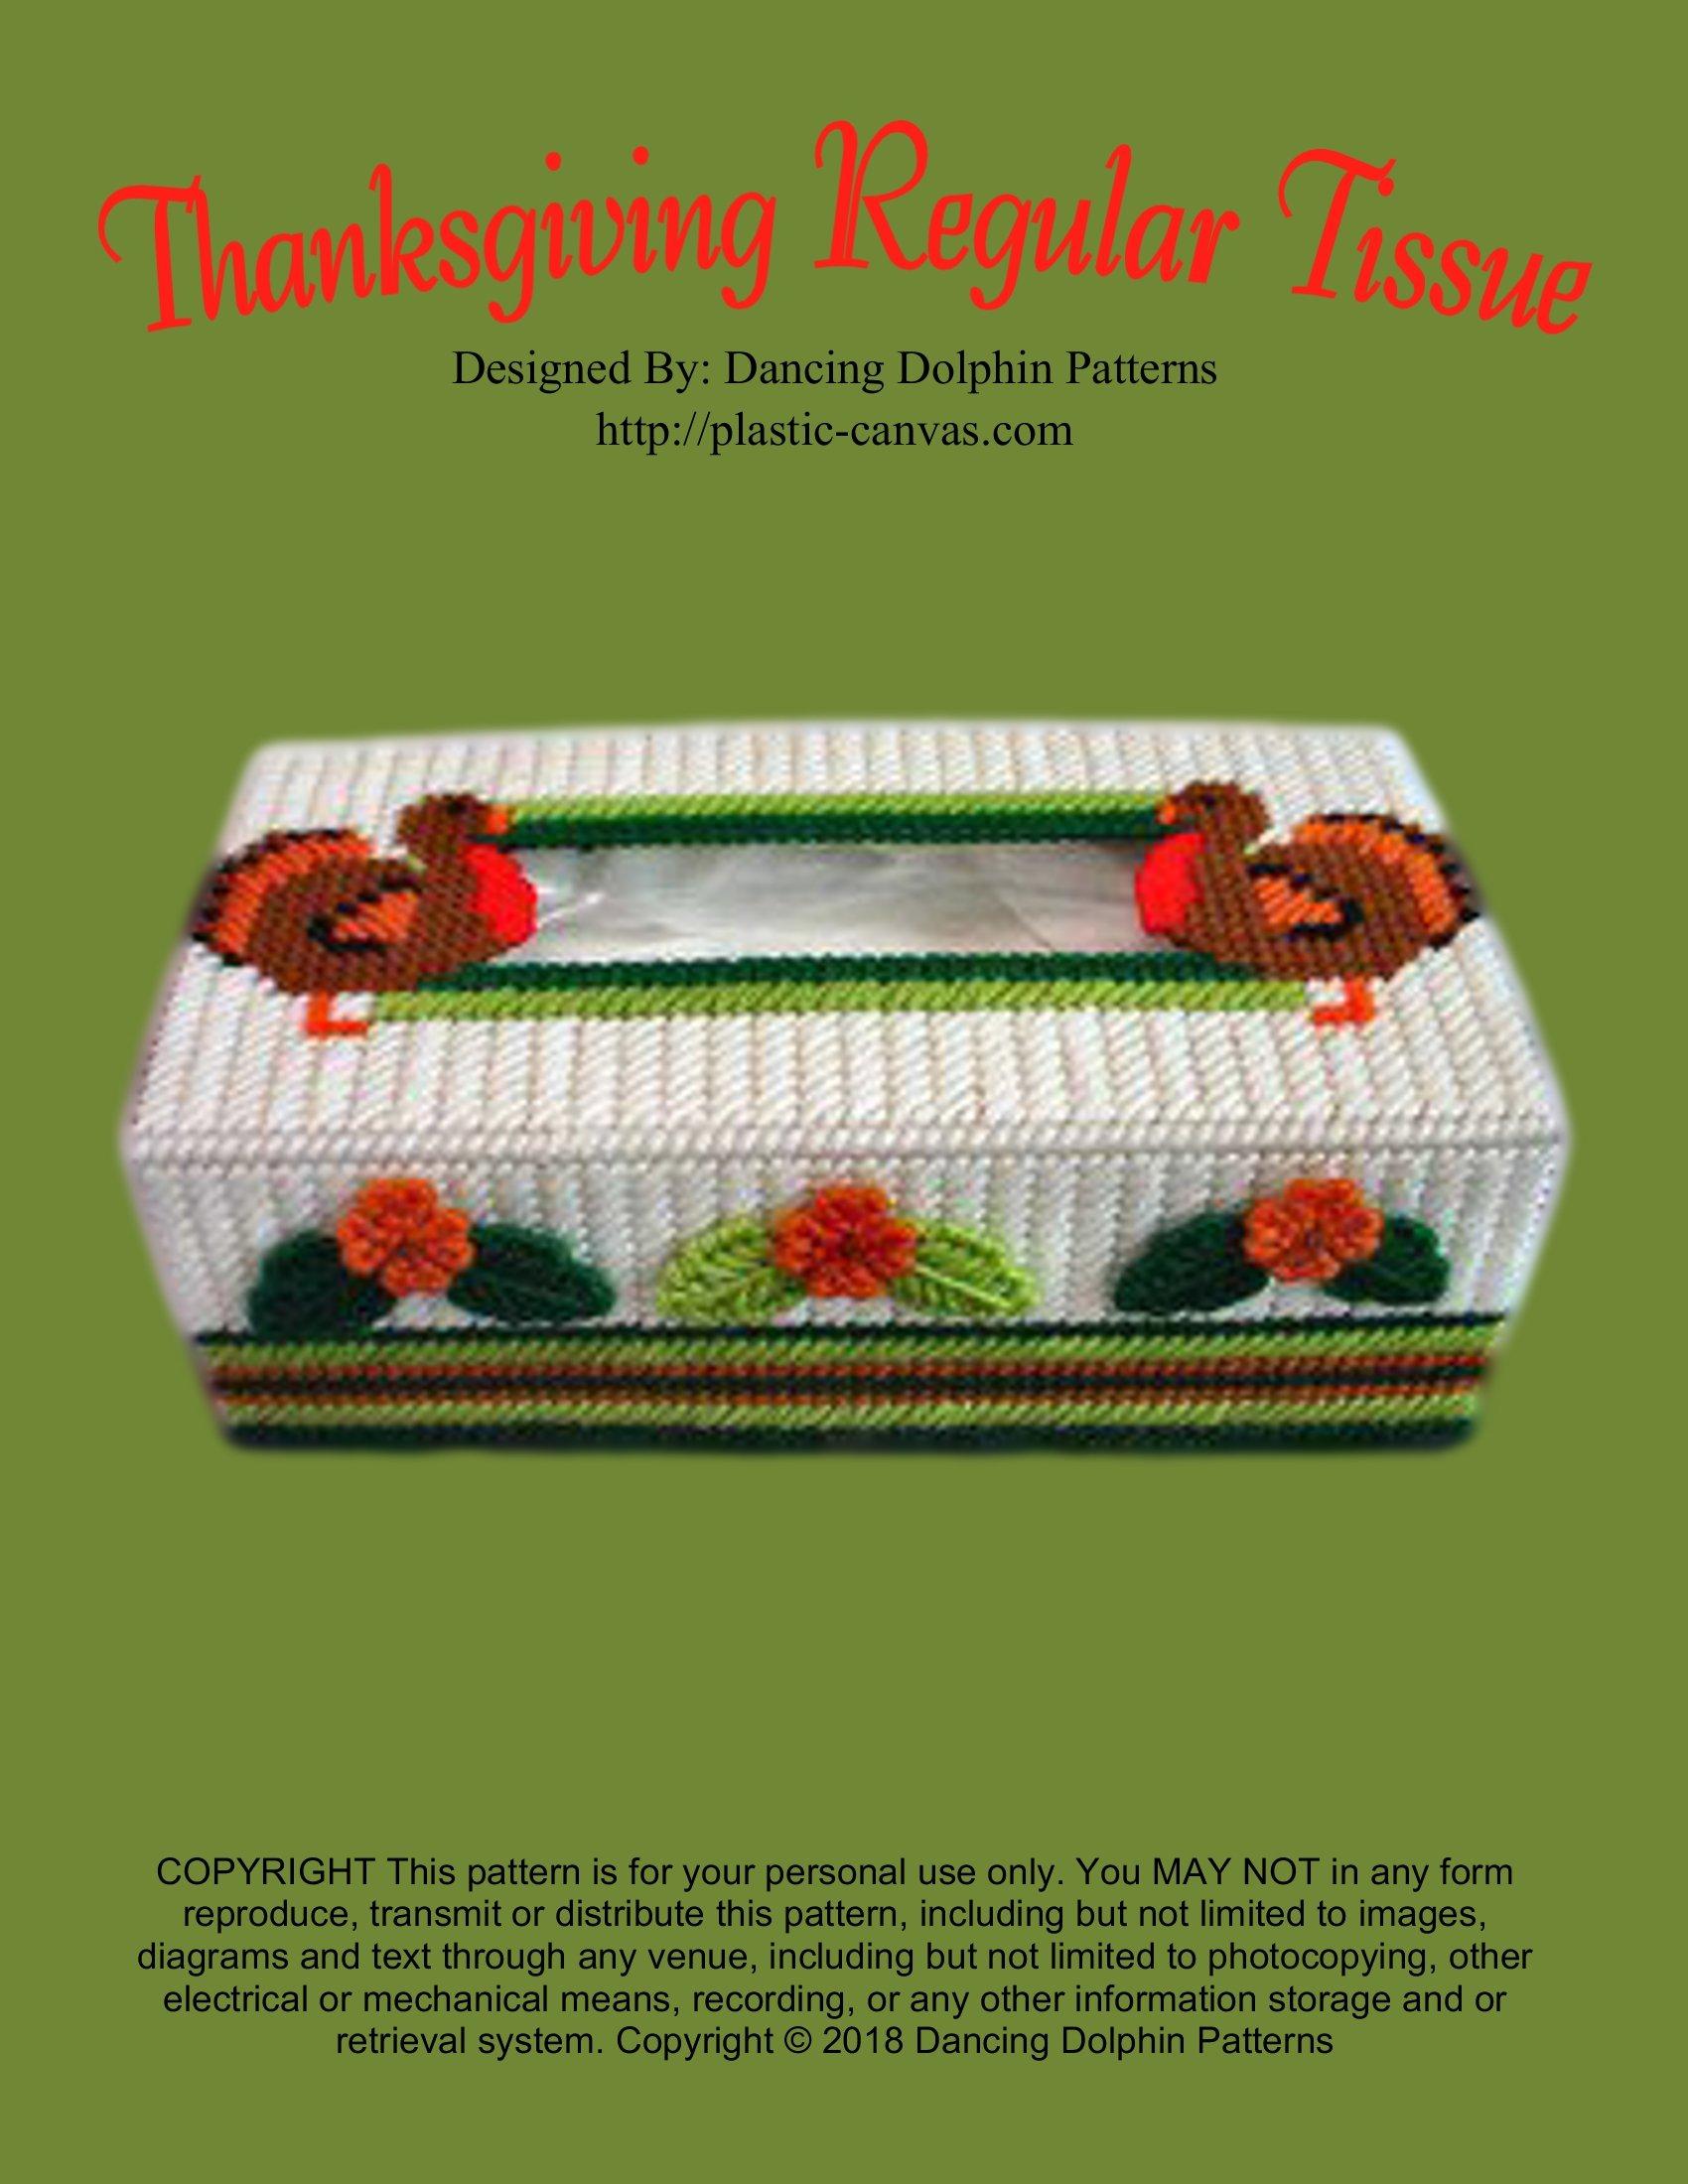 Thanksgiving Regular Tissue Box Cover  Plastic Canvas Pattern  English Edition